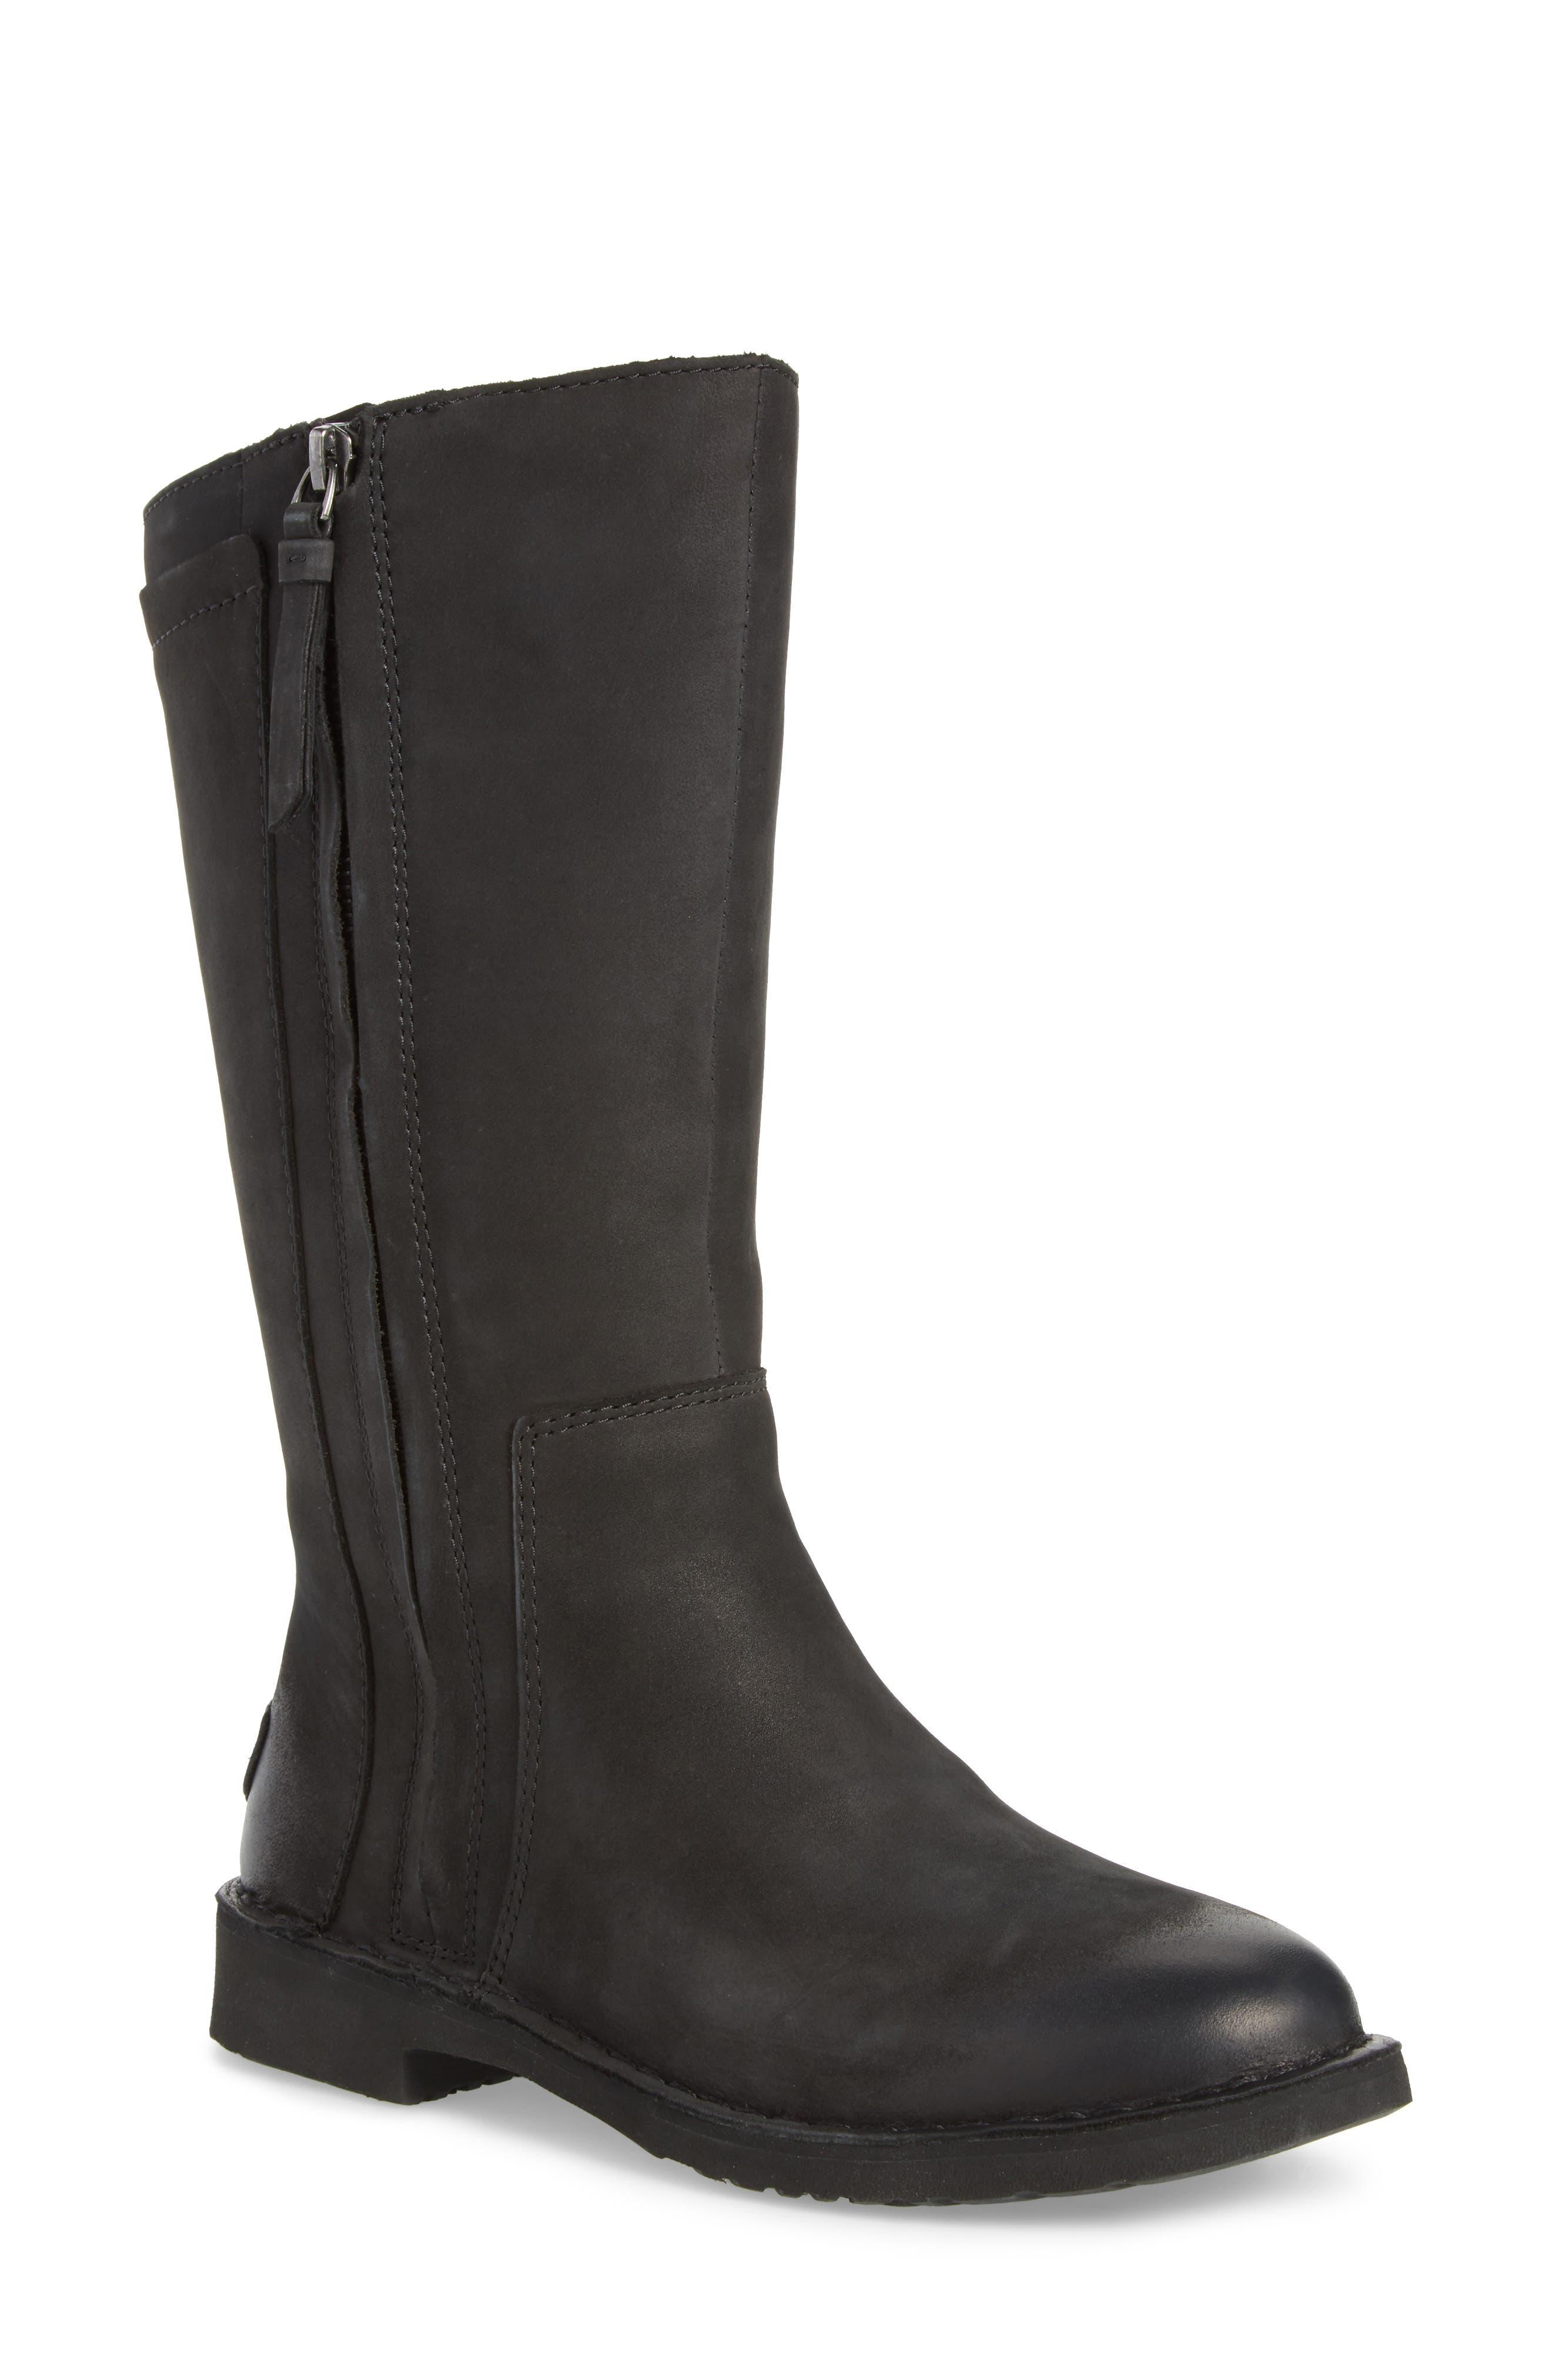 Main Image - UGG® Elly Boot (Women)